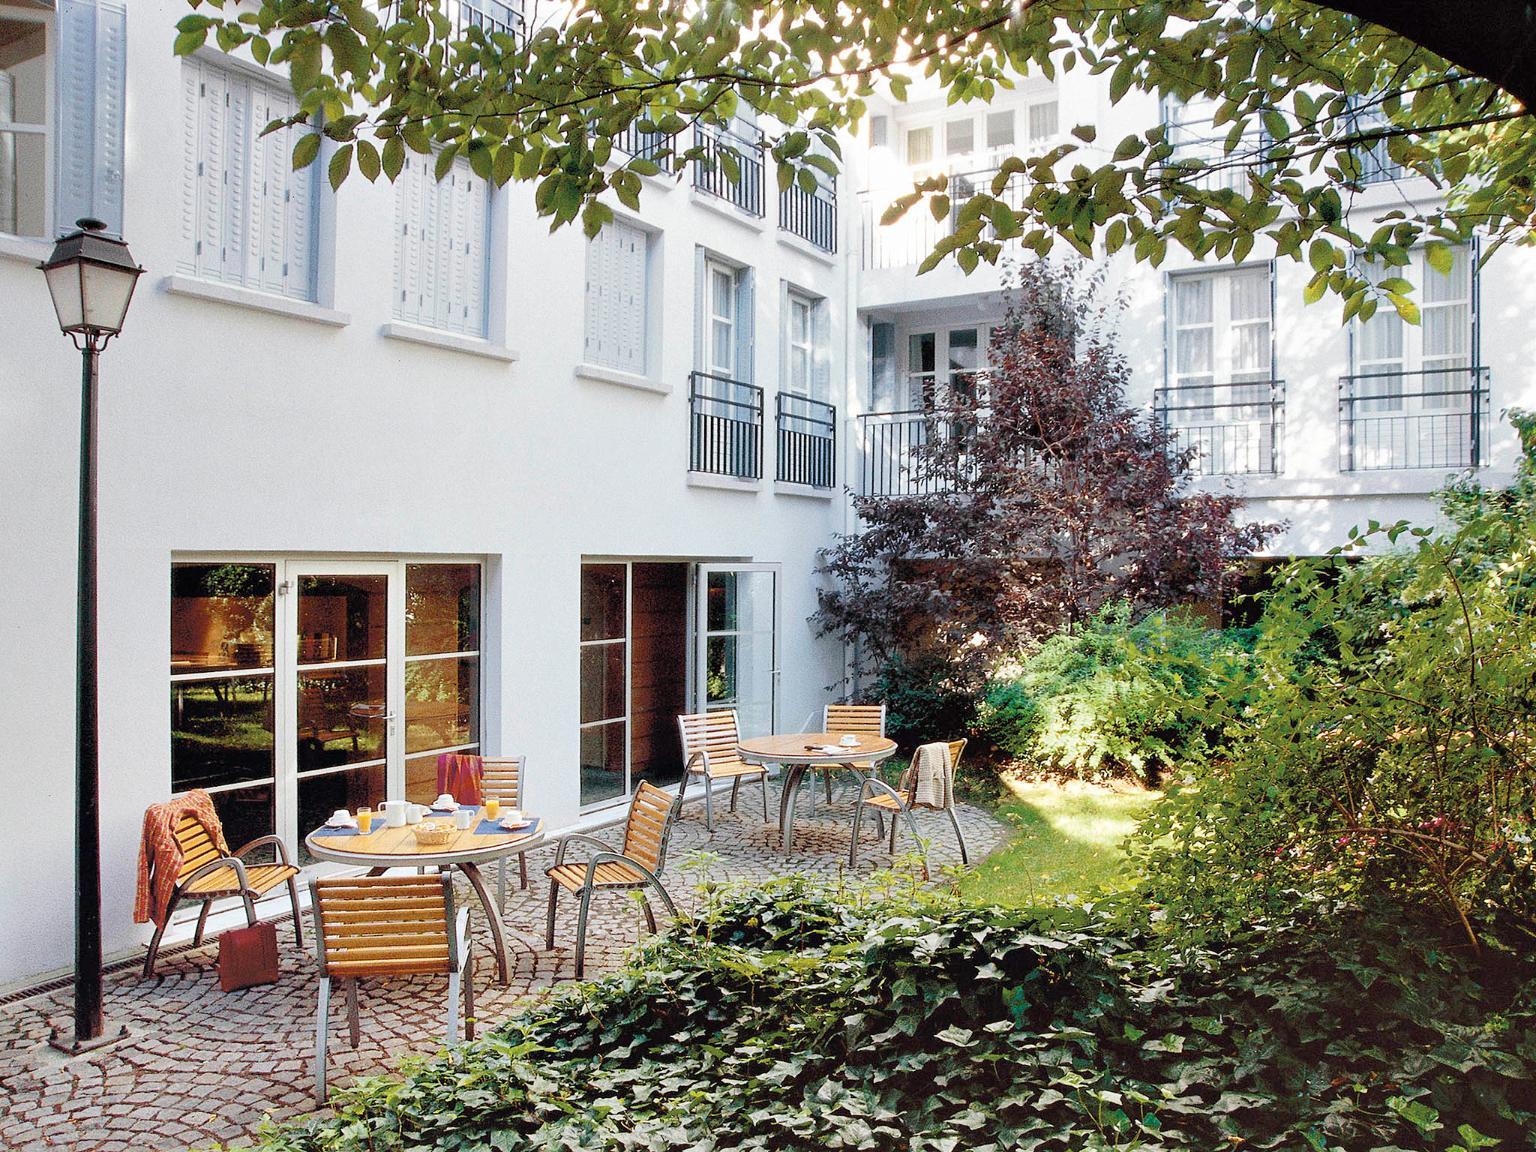 Aparthotel adagio paris montmartre h tel 10 place - Parking porte de clignancourt paris 18 ...